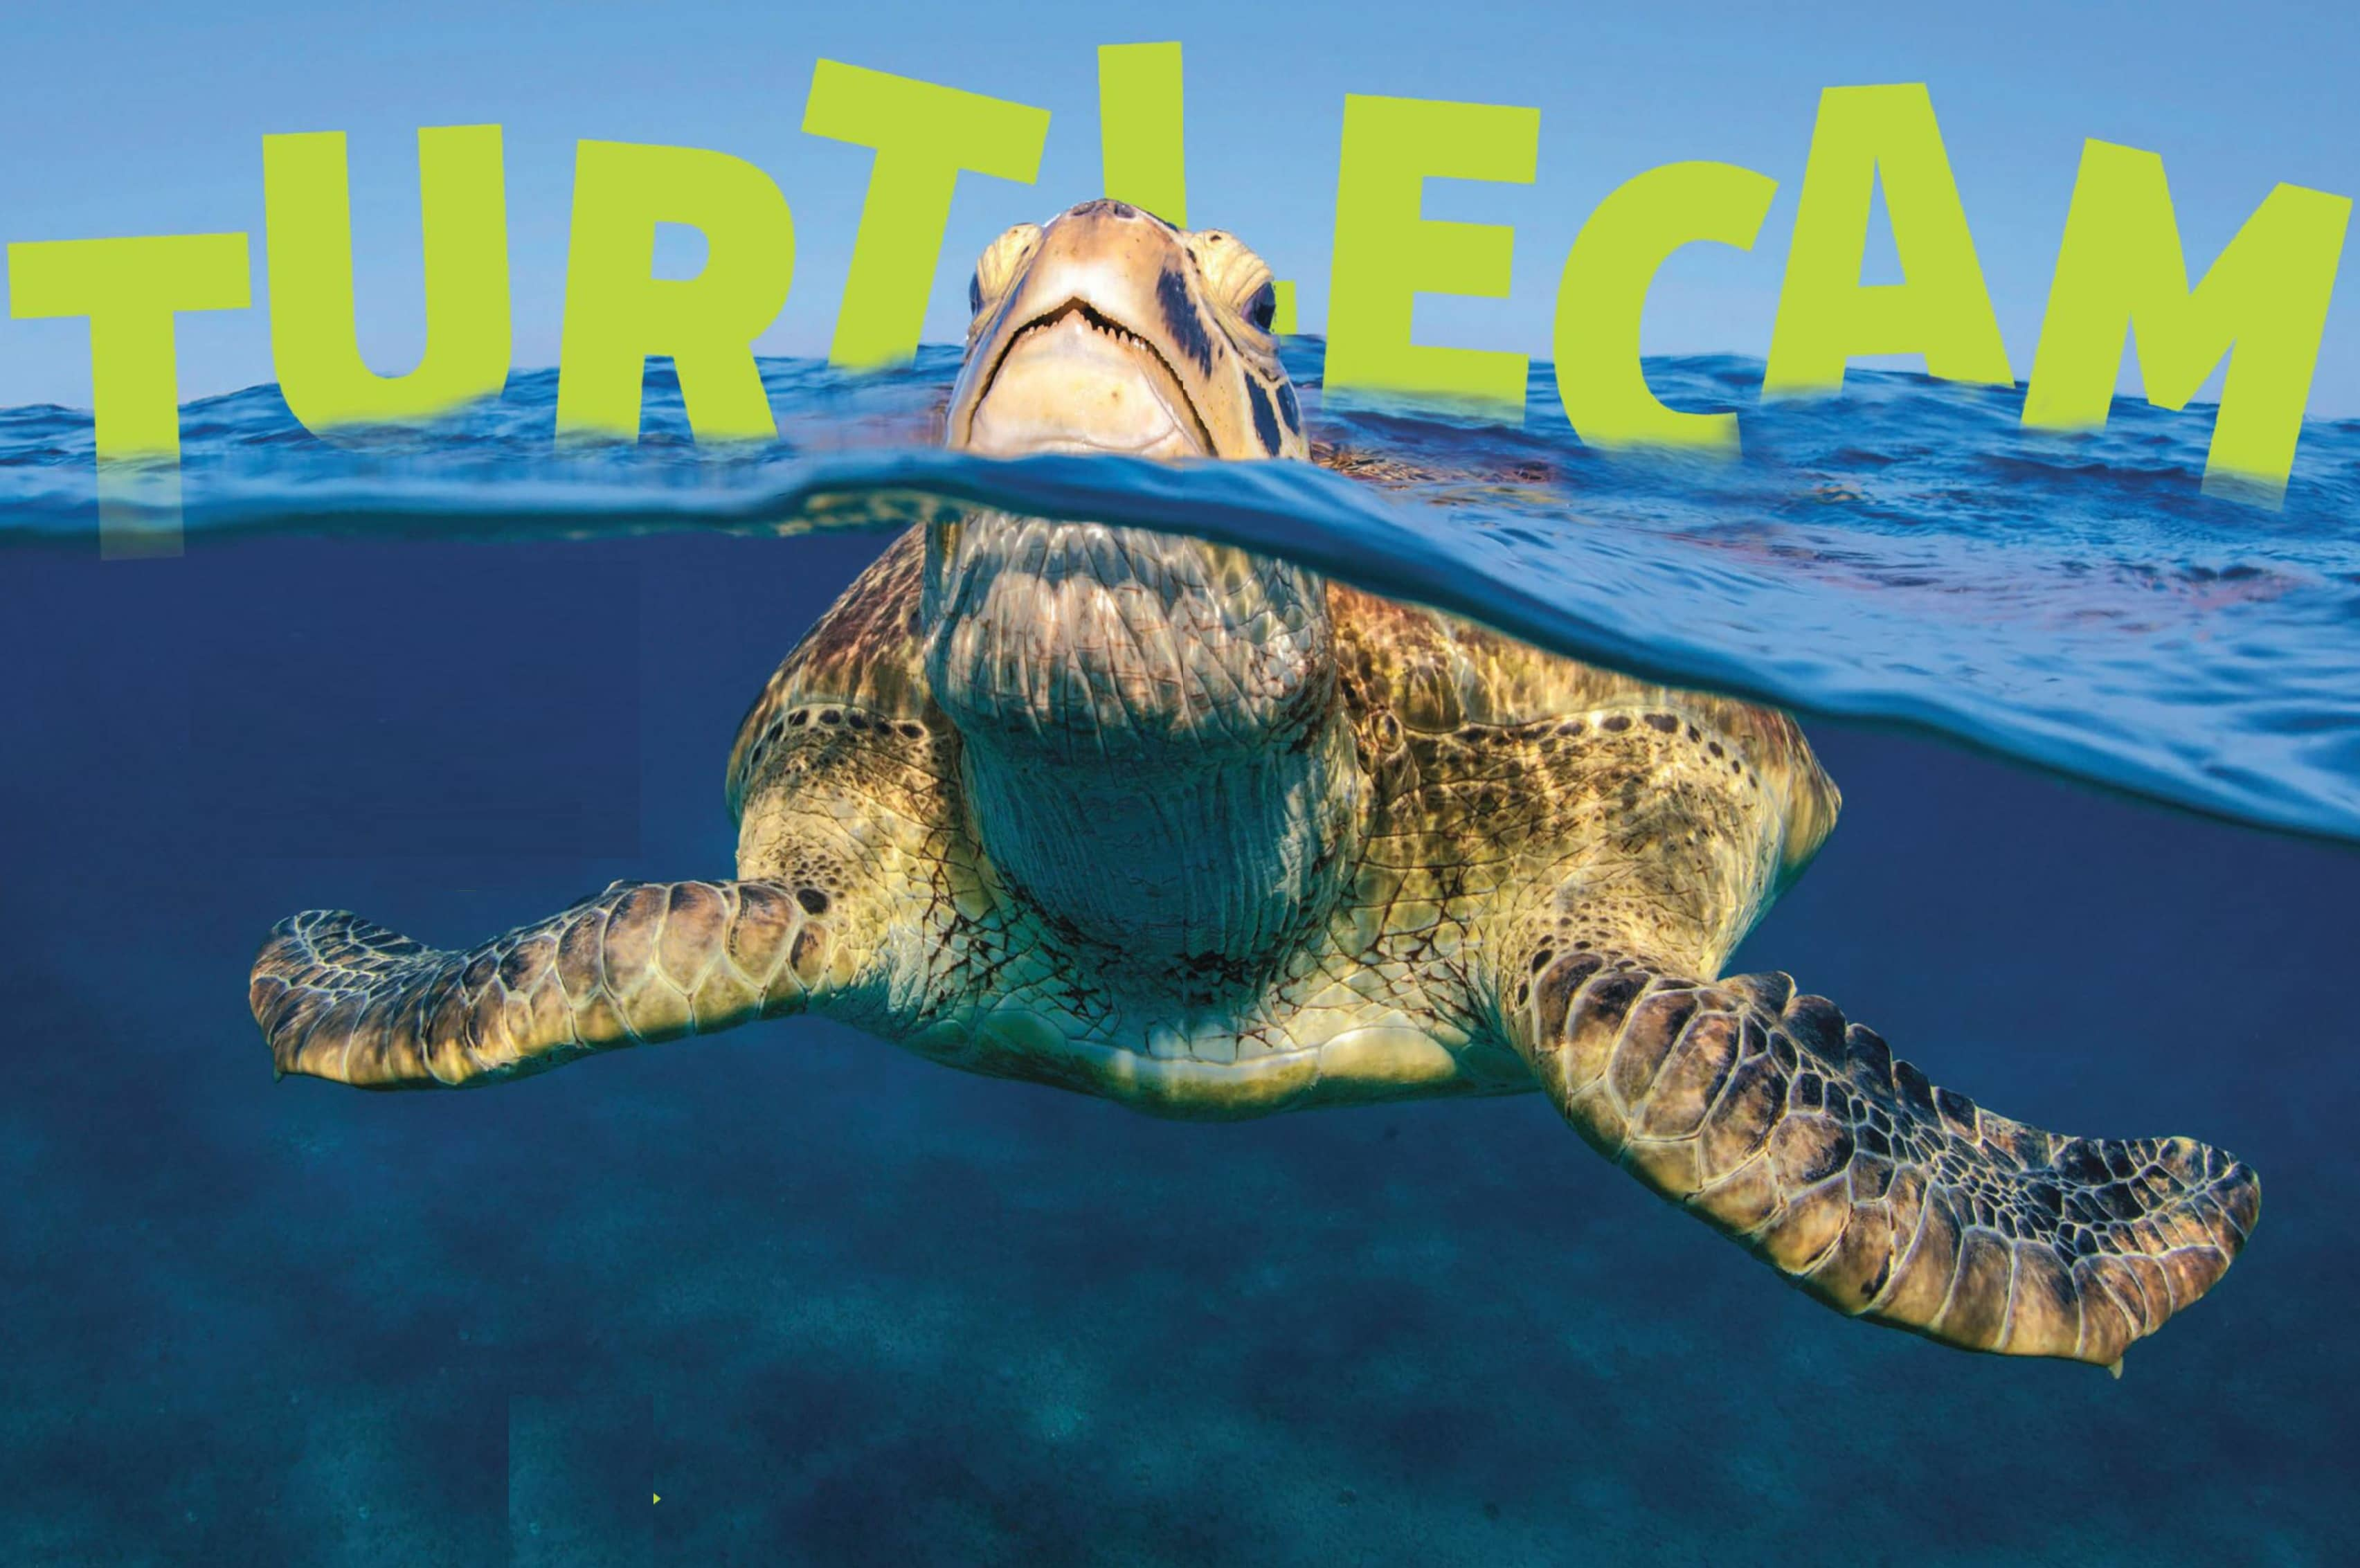 Turtlecam